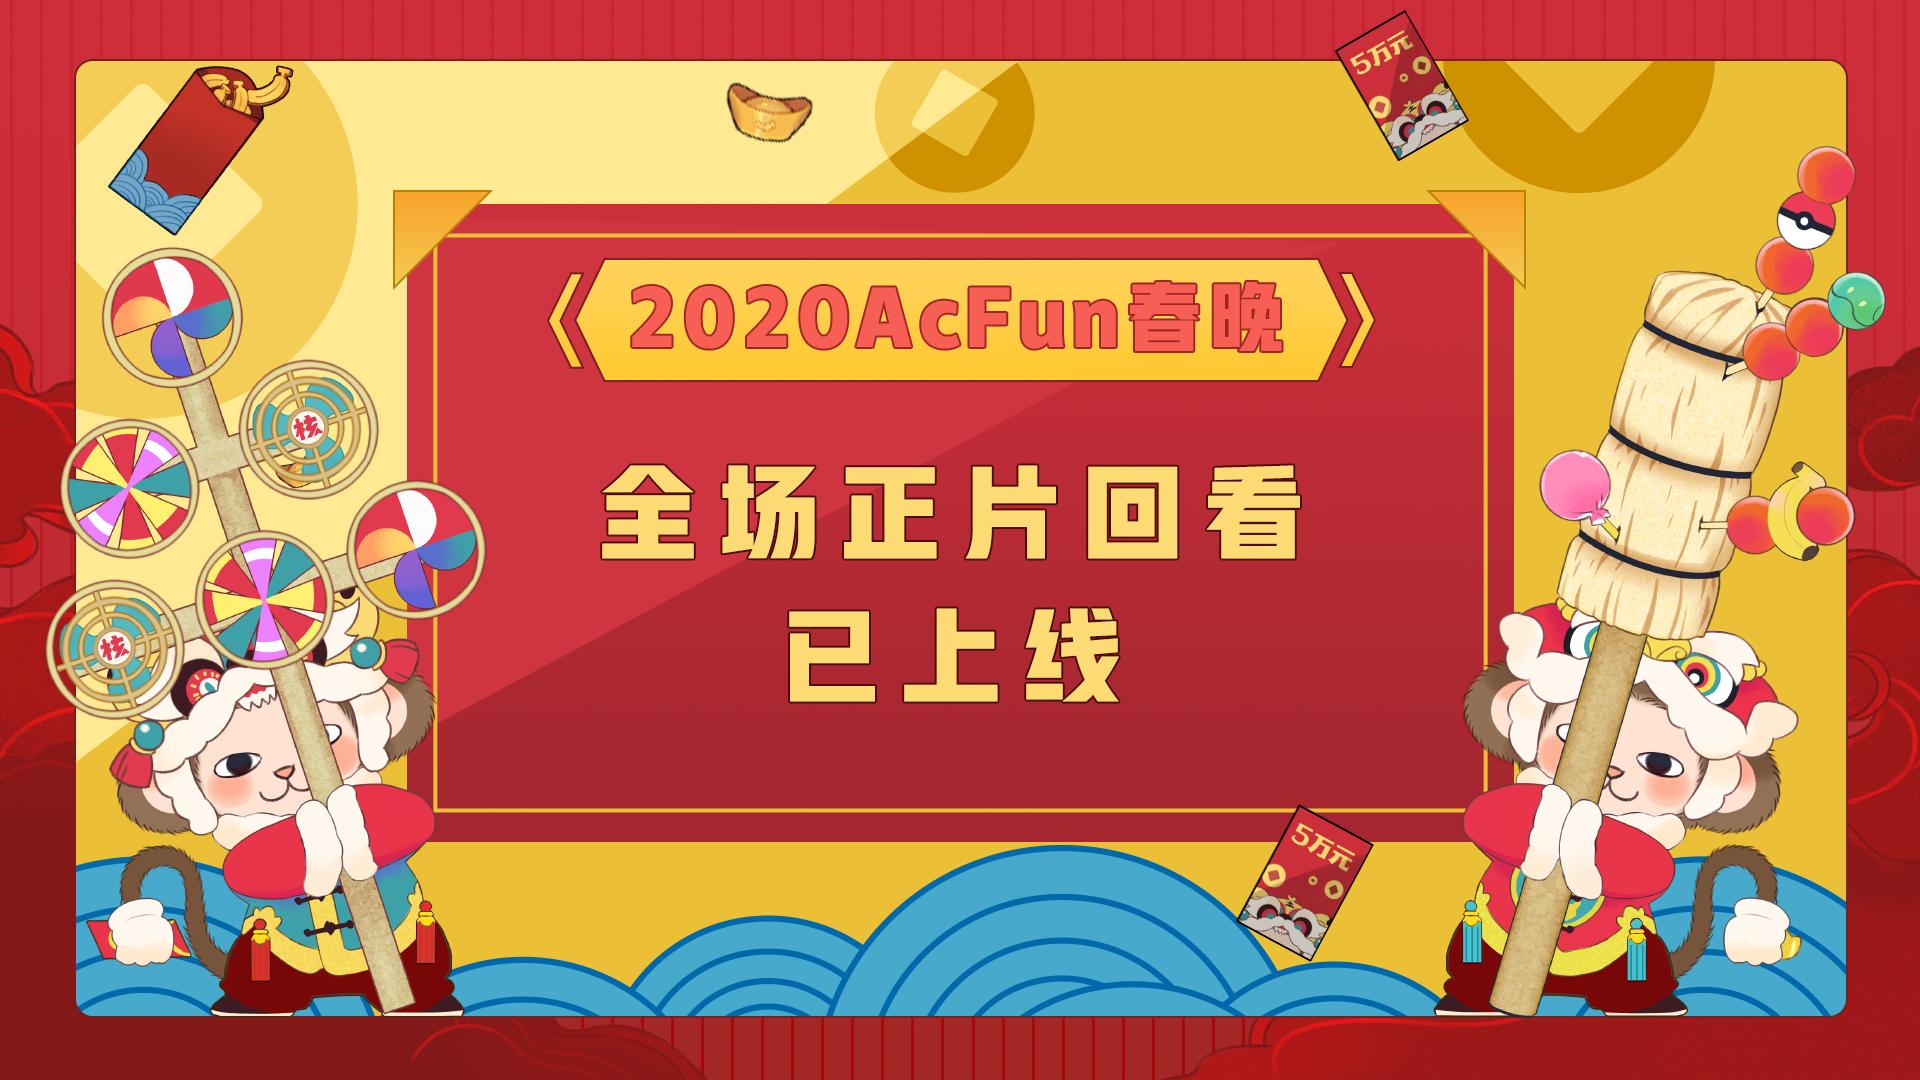 【2020A站春晚】全场正片(含彩蛋)-AC饭,团圆Fun!